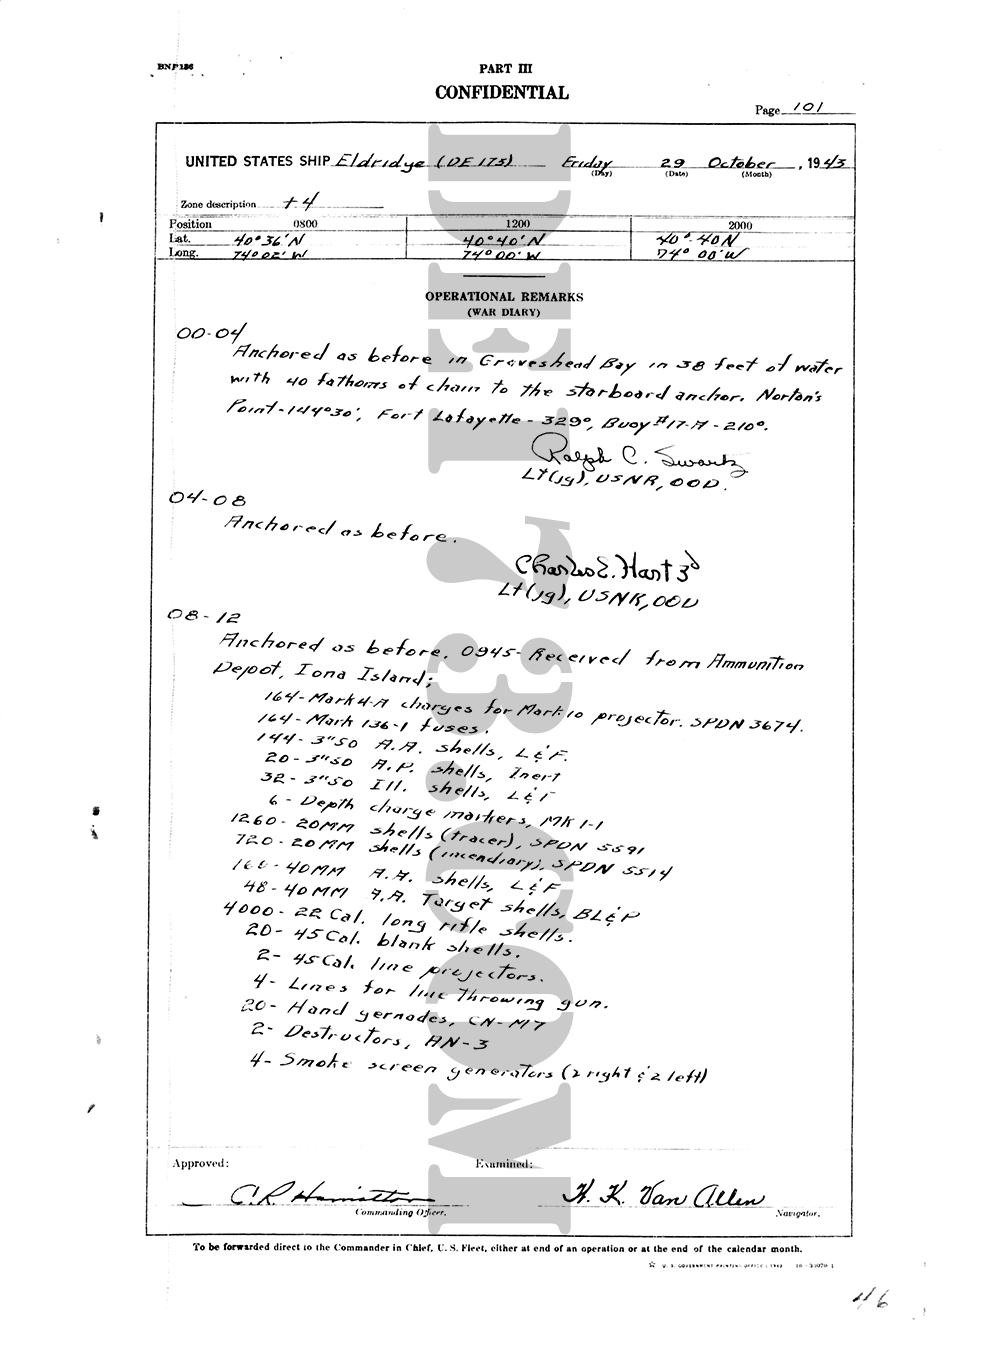 USS Eldridge Microfilm Page 101 / October 29th, 1943